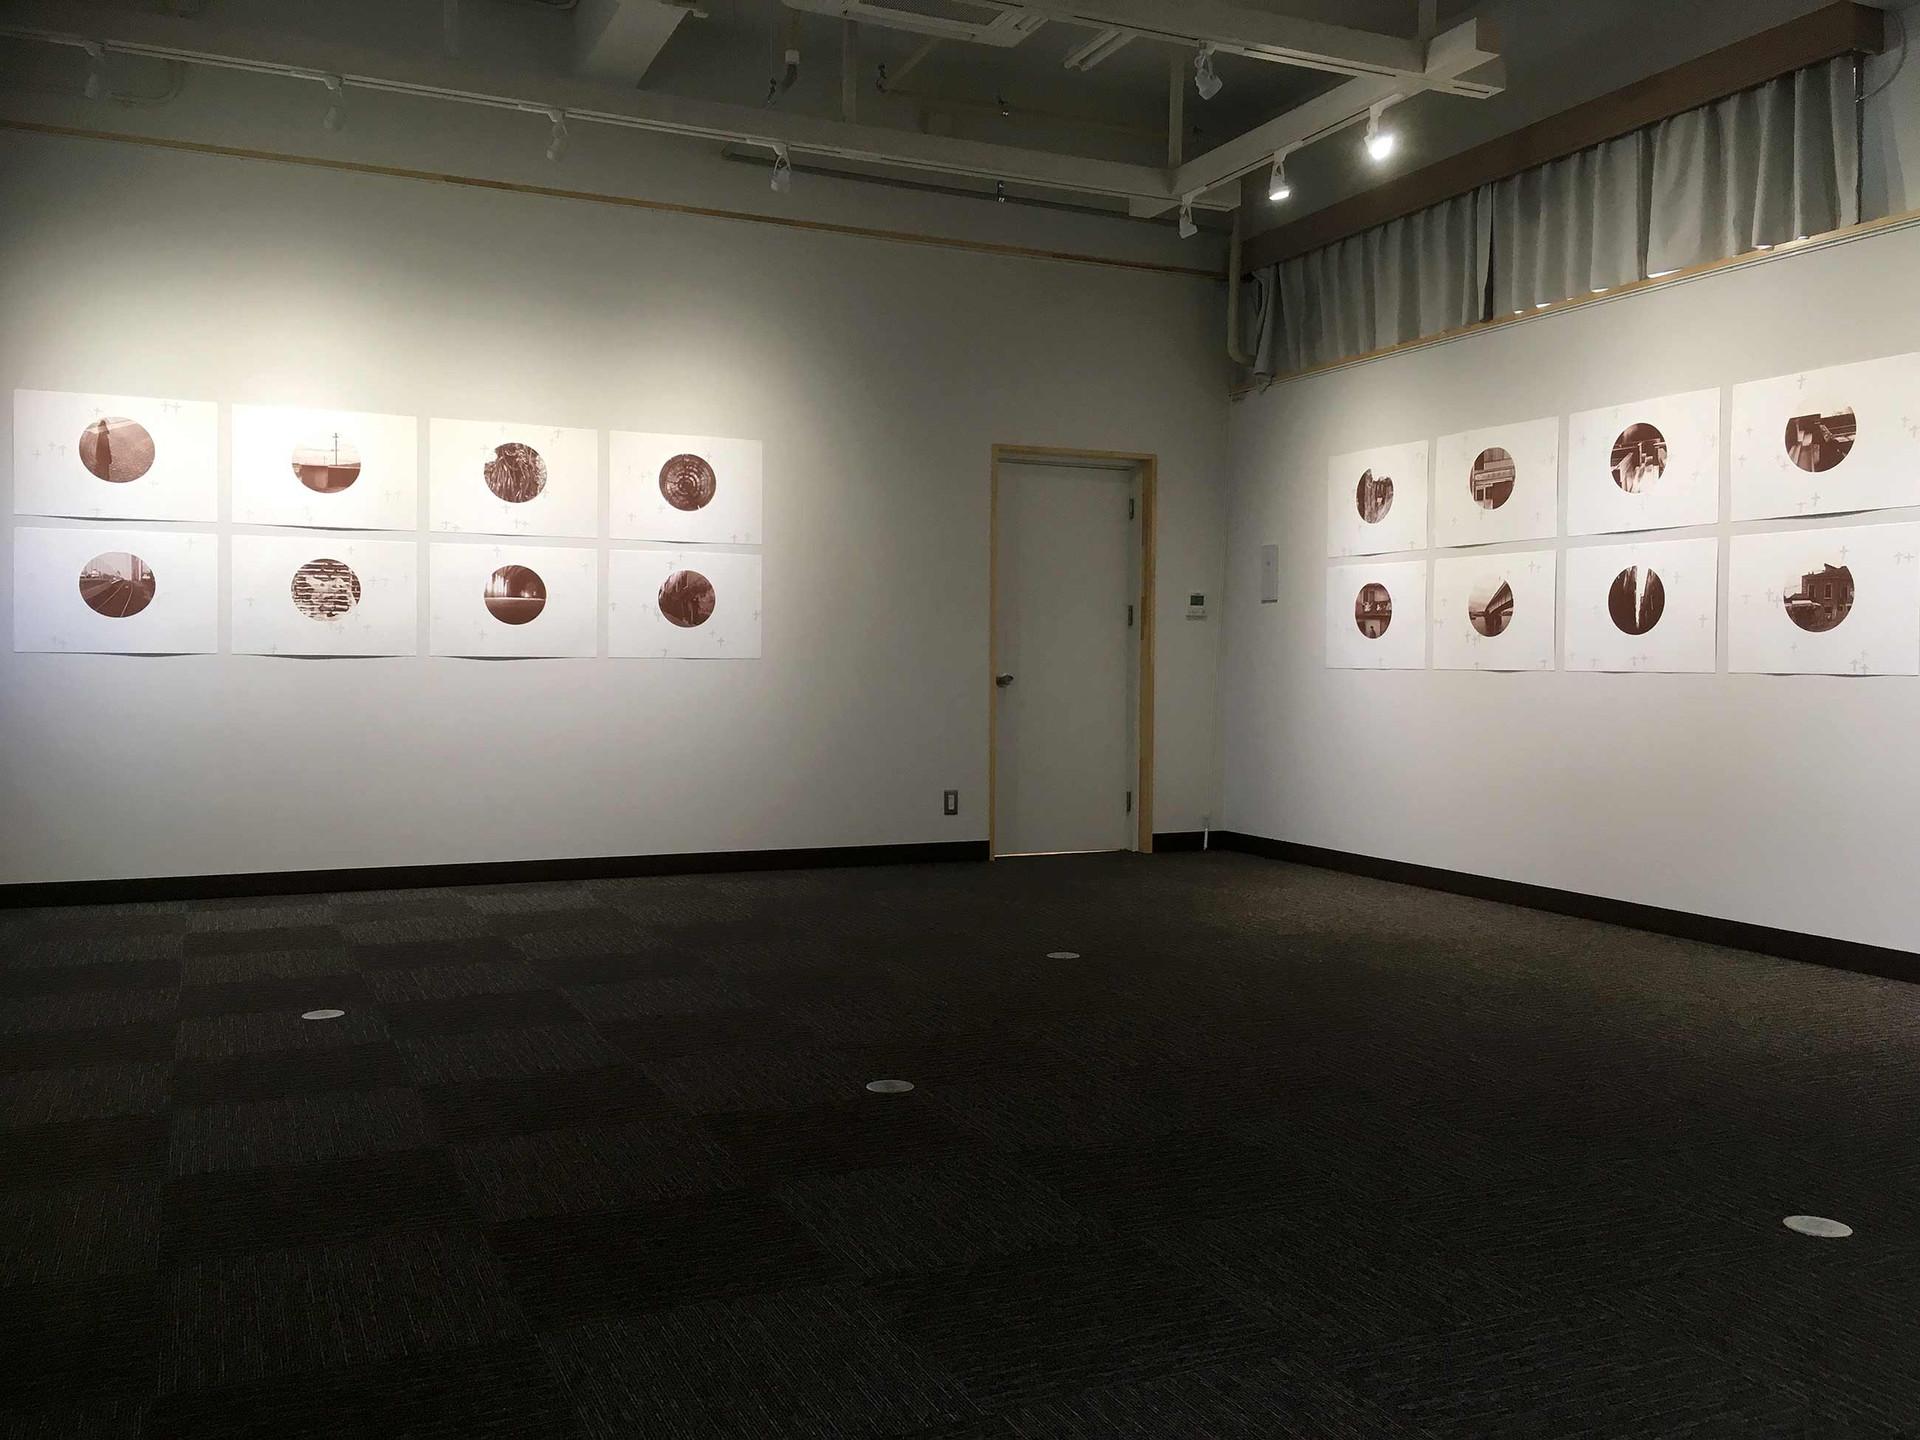 » SOLO « - レジデンス成果展 - / 南島原市アートビレッジ・シラキノ